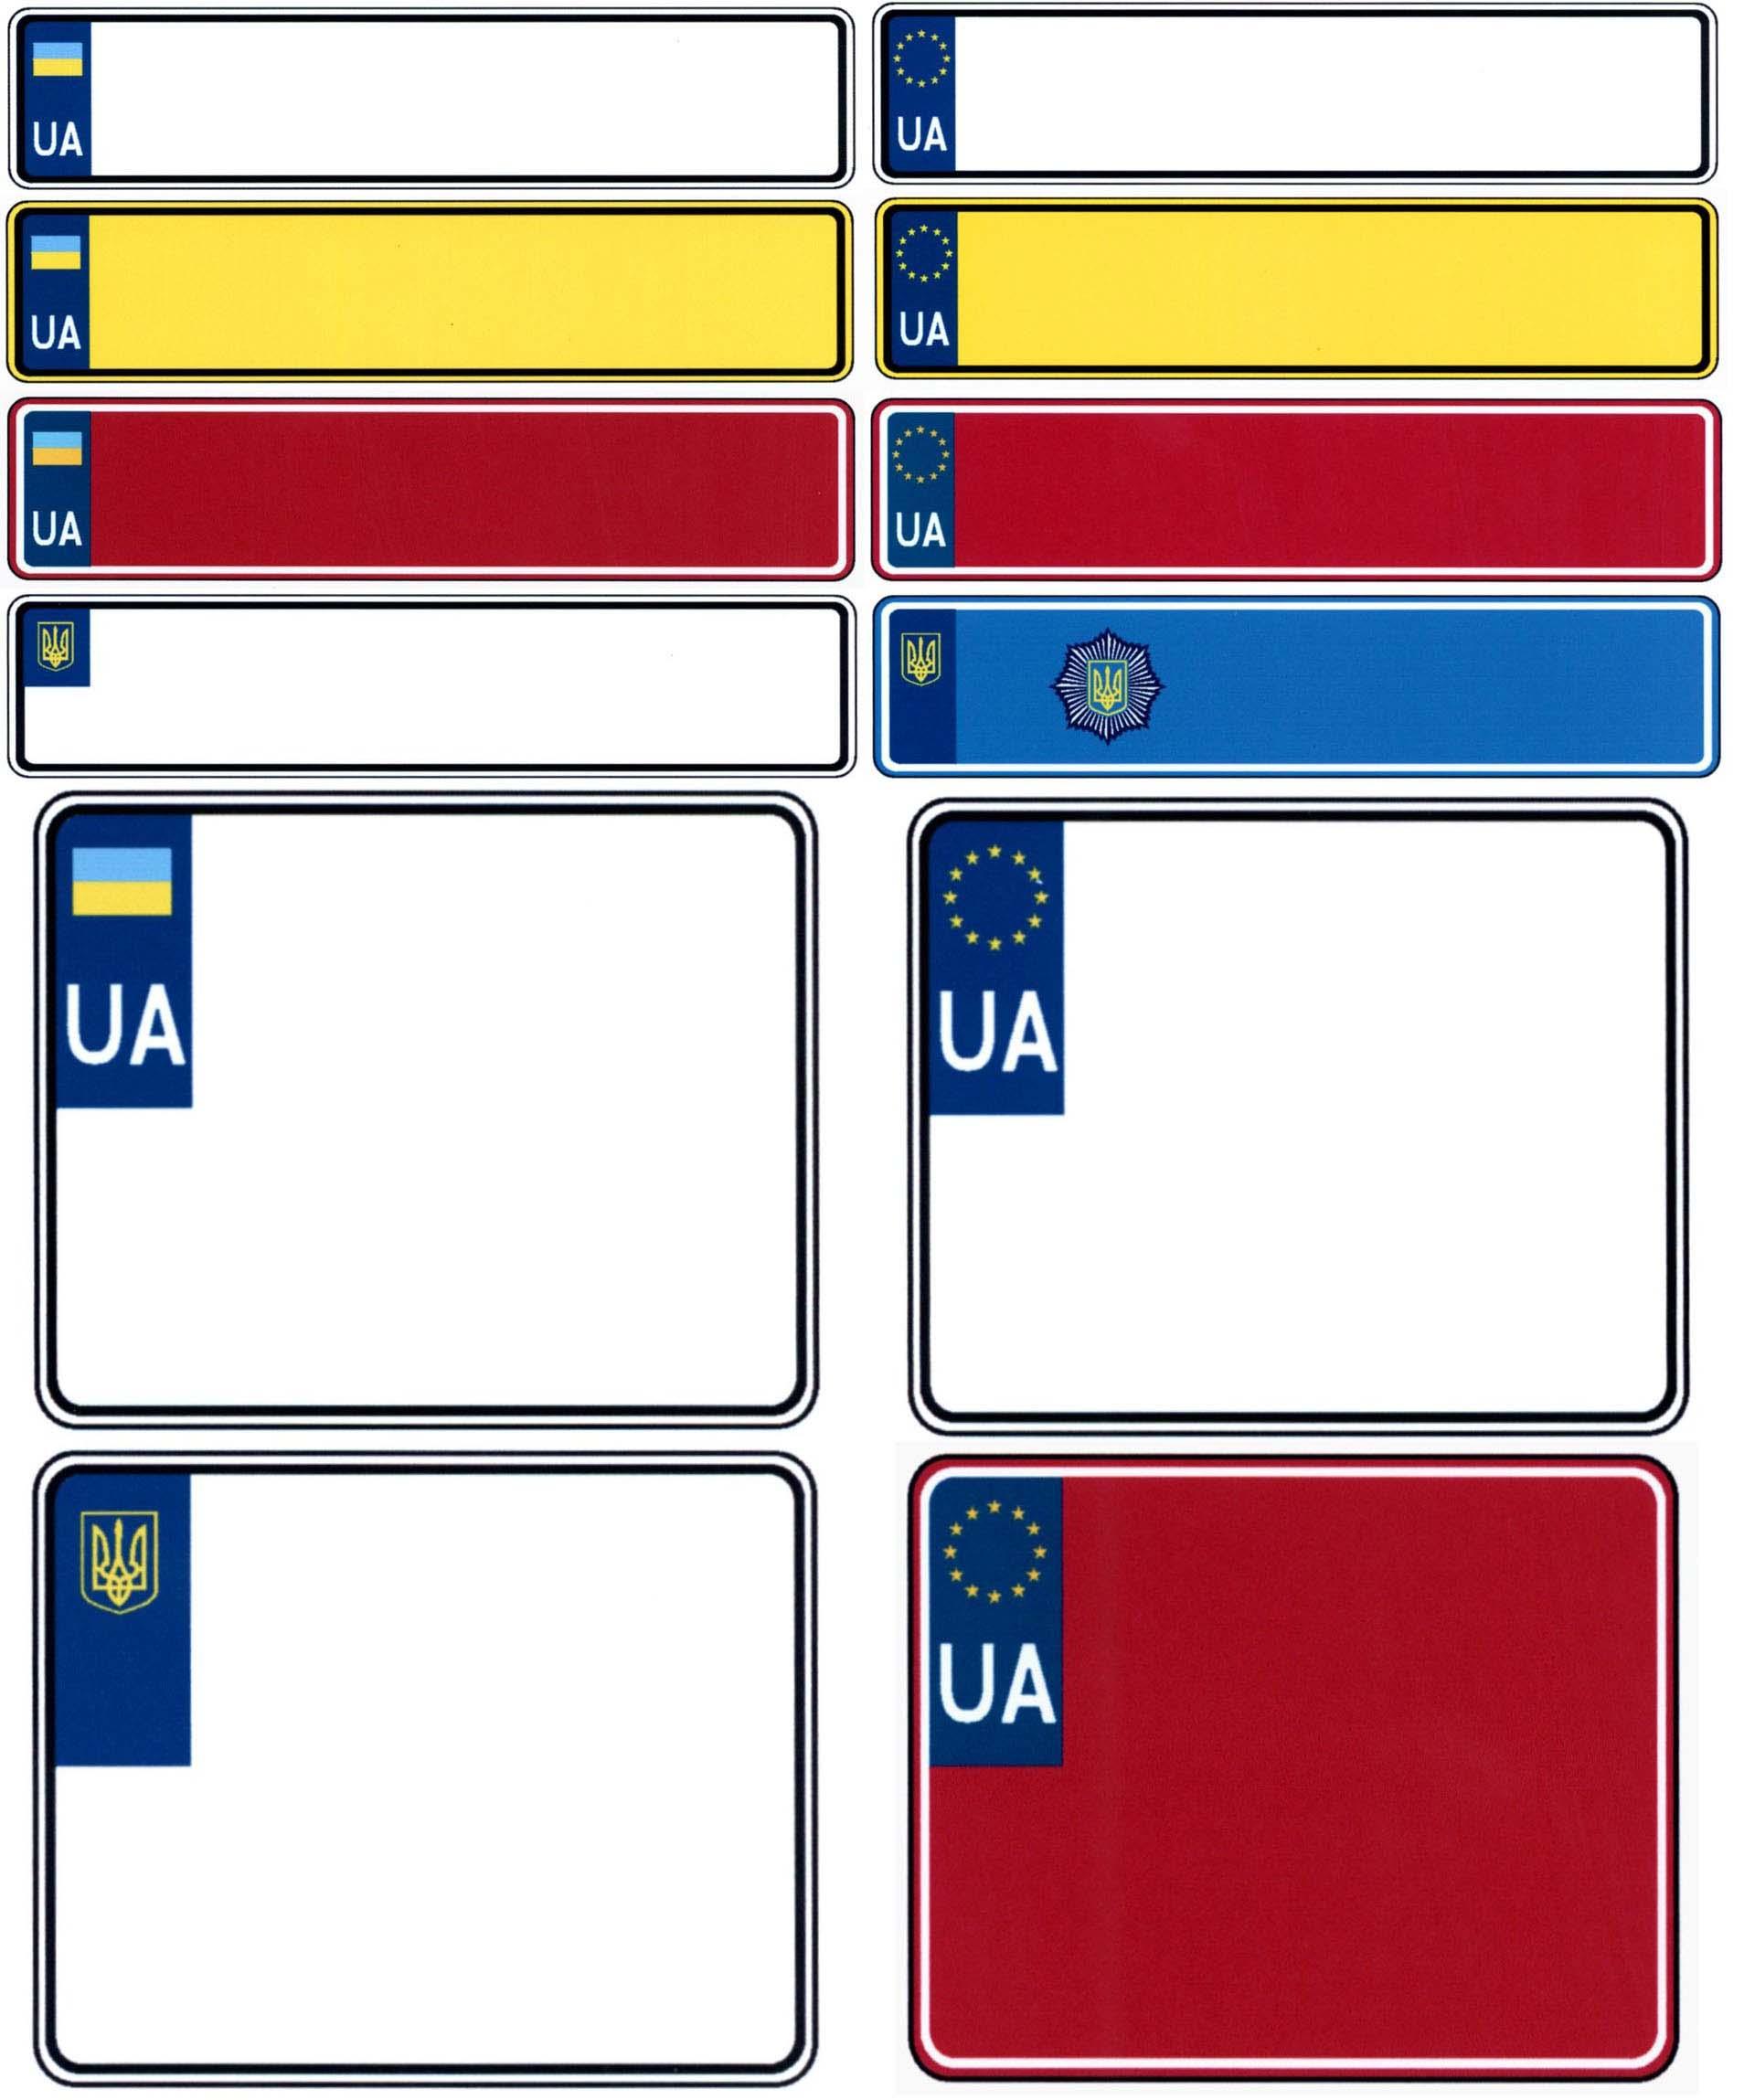 Изображение стороннего сайта - http://autonews.autoua.net/media/uploads/raznoe/ukraine_new_plates.jpg